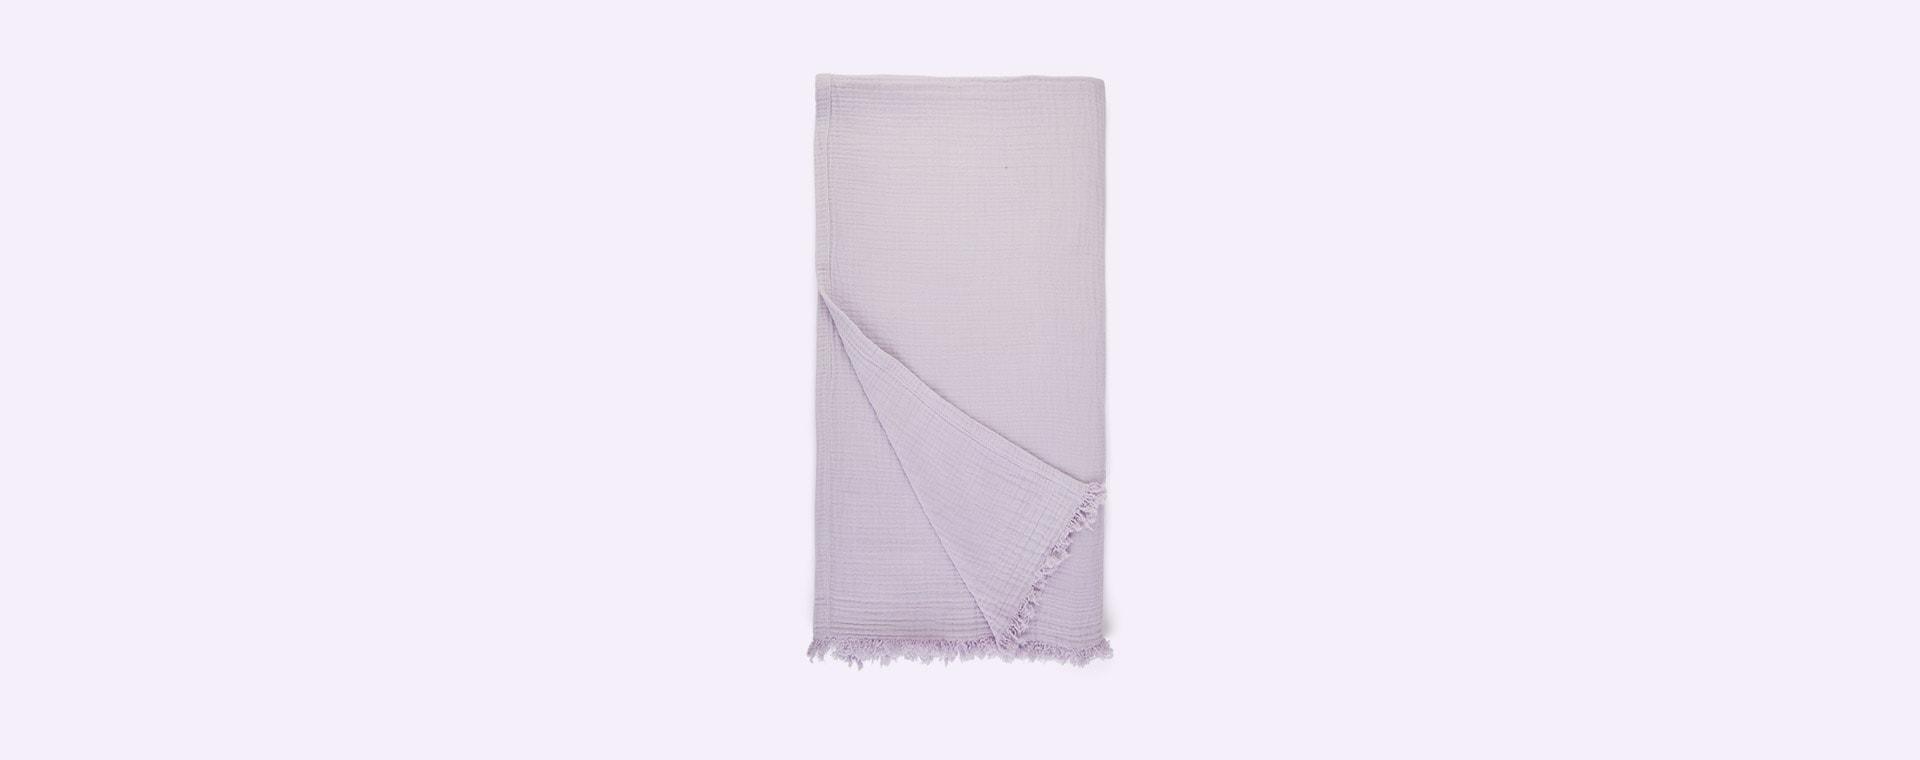 Light Lavender Liewood Magda Muslin Blanket